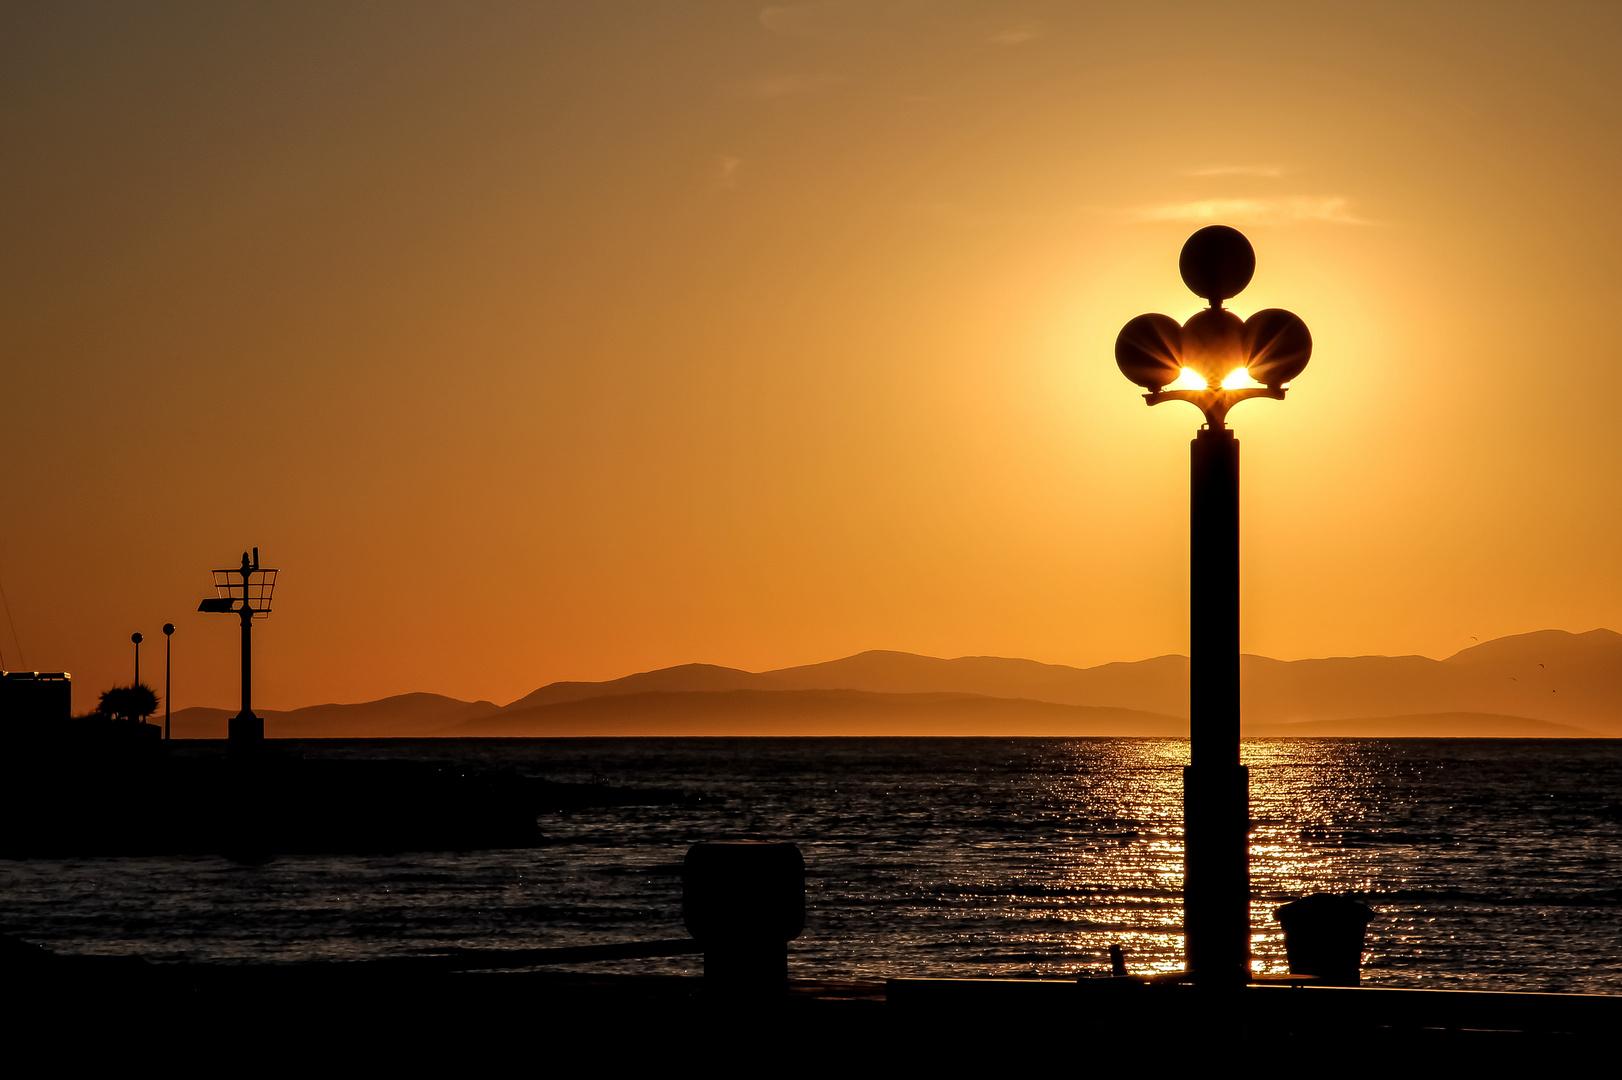 Die Sonne strahlt